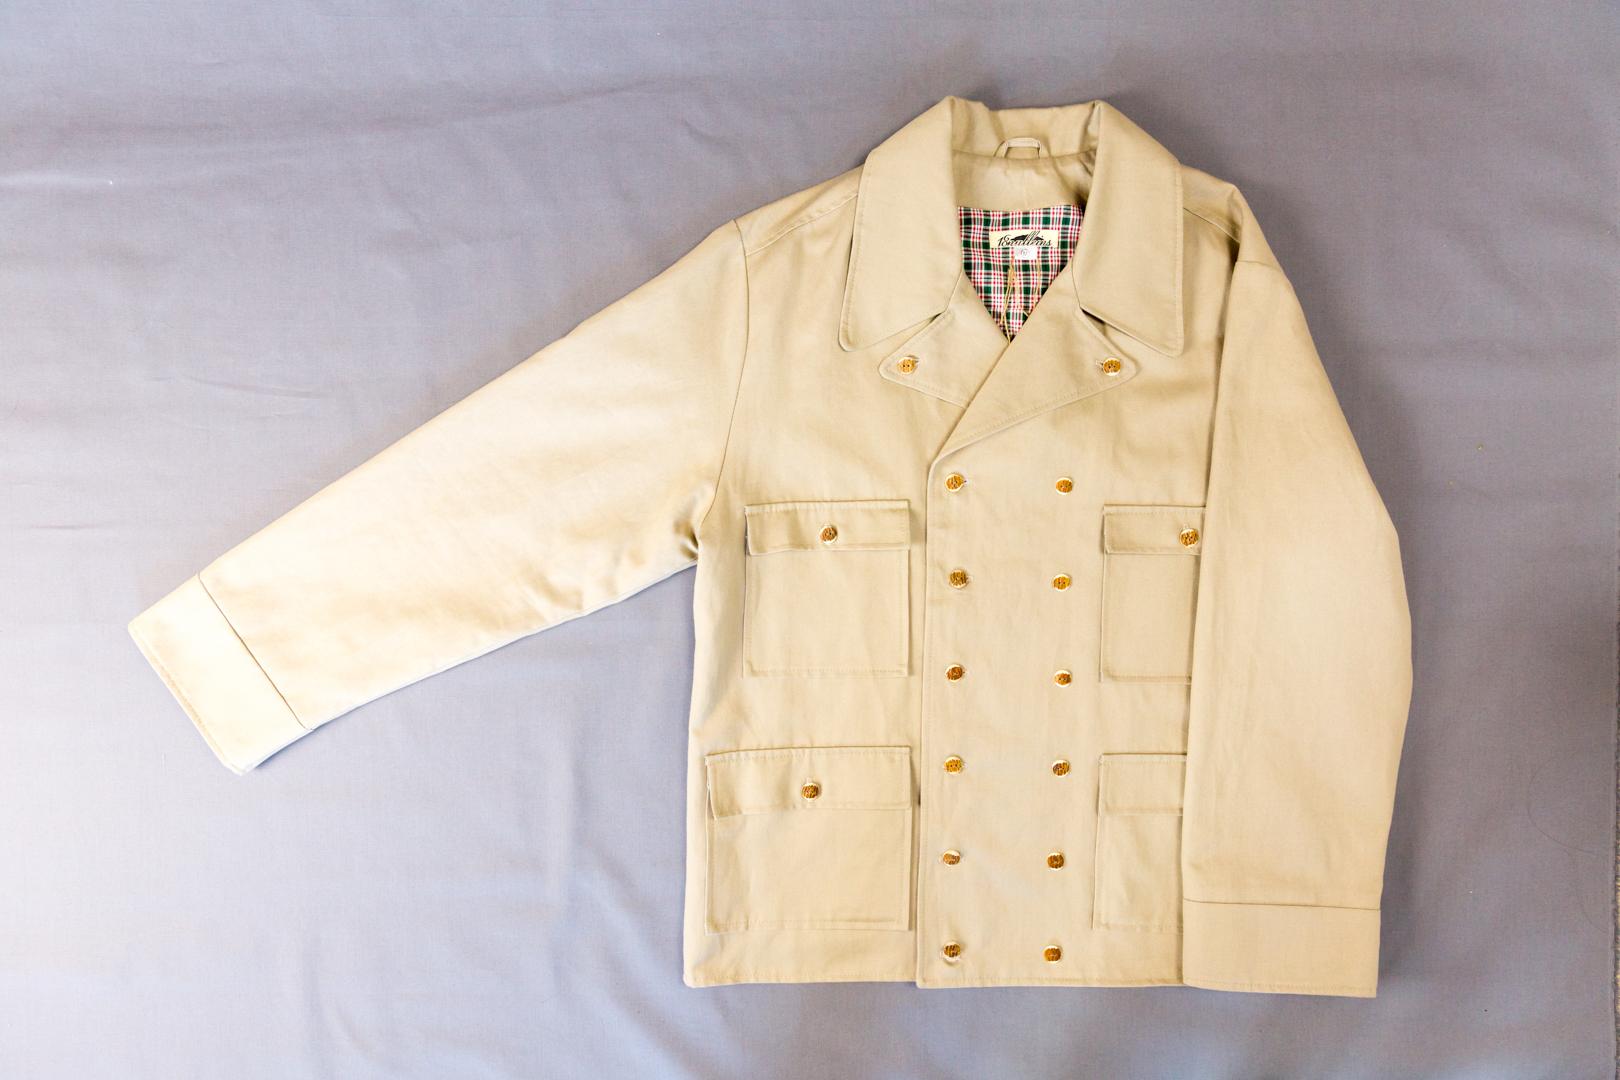 Jacken Retro Bergbekleidung